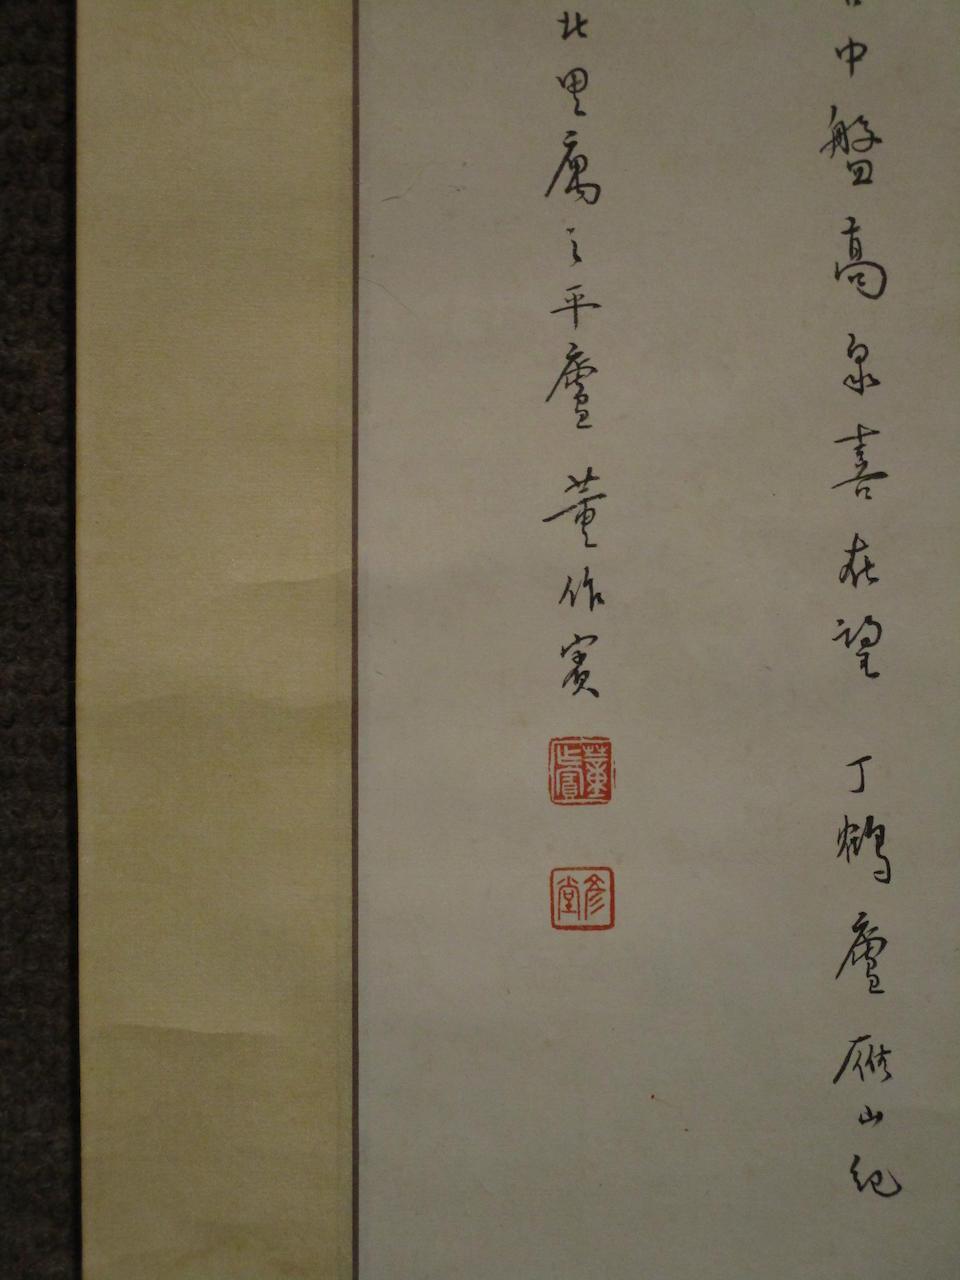 Dong Zuobin (1895-1963) Calligraphy in Oracle Bone Script, 1962